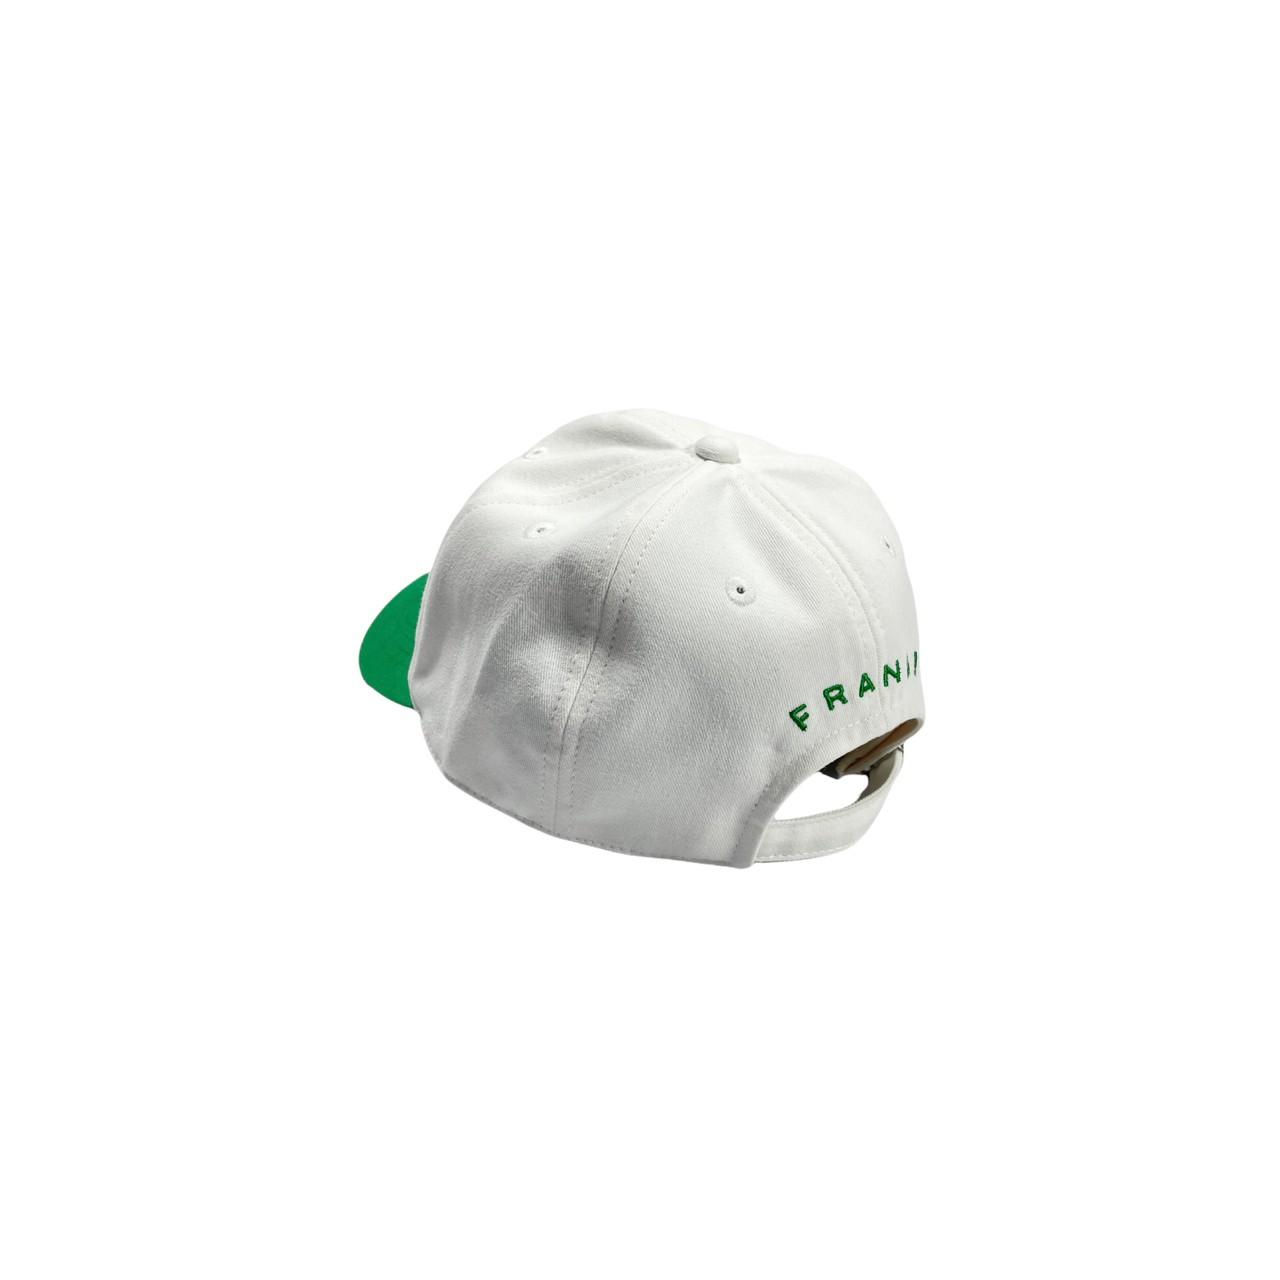 Eric two-tone cap (Green)